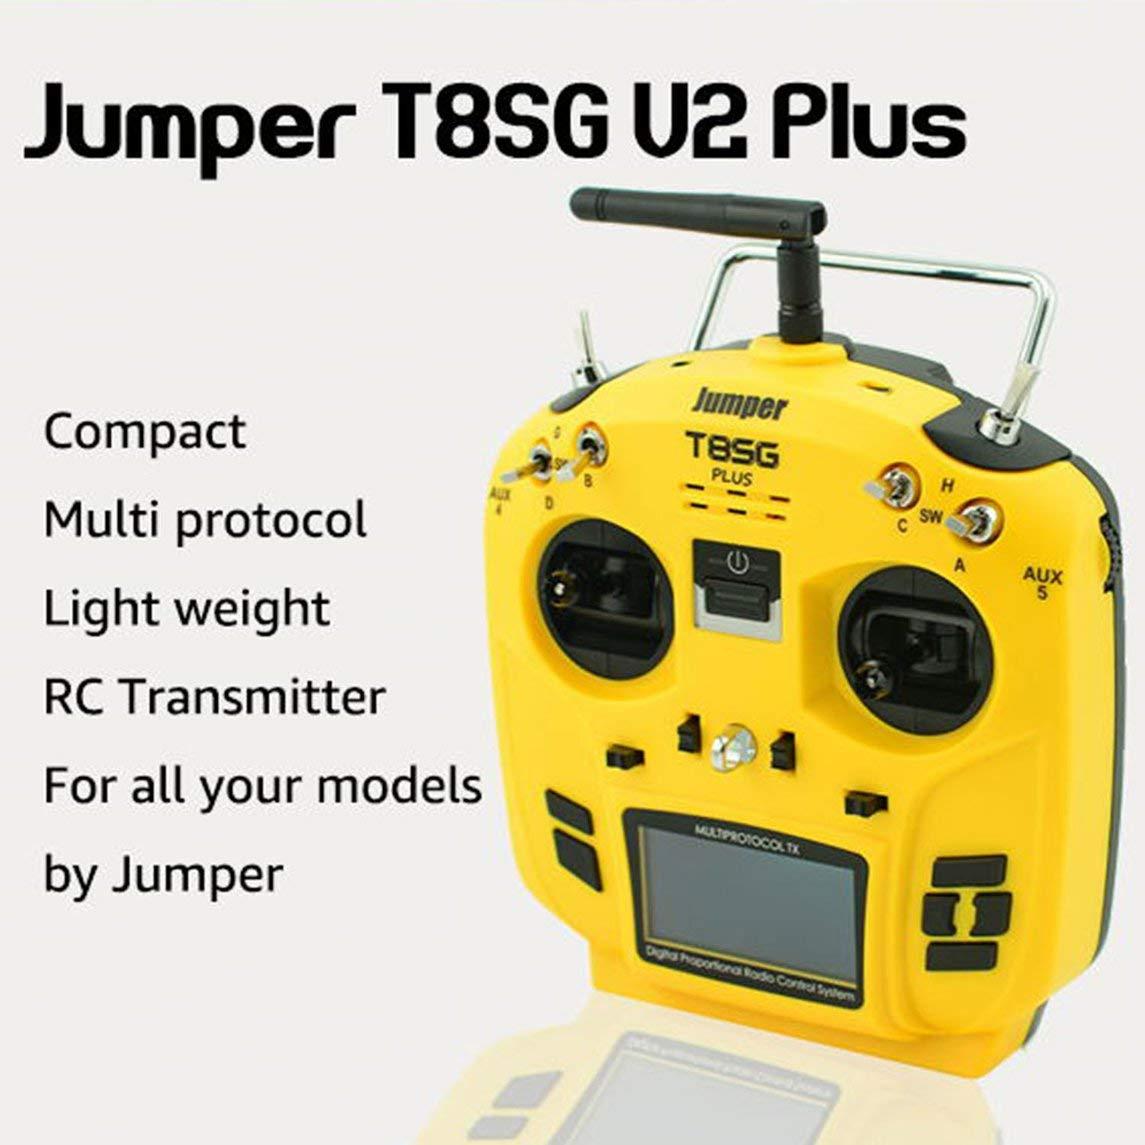 Footprintse T8SG Jumper V2 / V2.0 Plus/Erweiterte Multi-Protokoll 12CH Compact Transmitter-Farbe:Gelb Schwarz